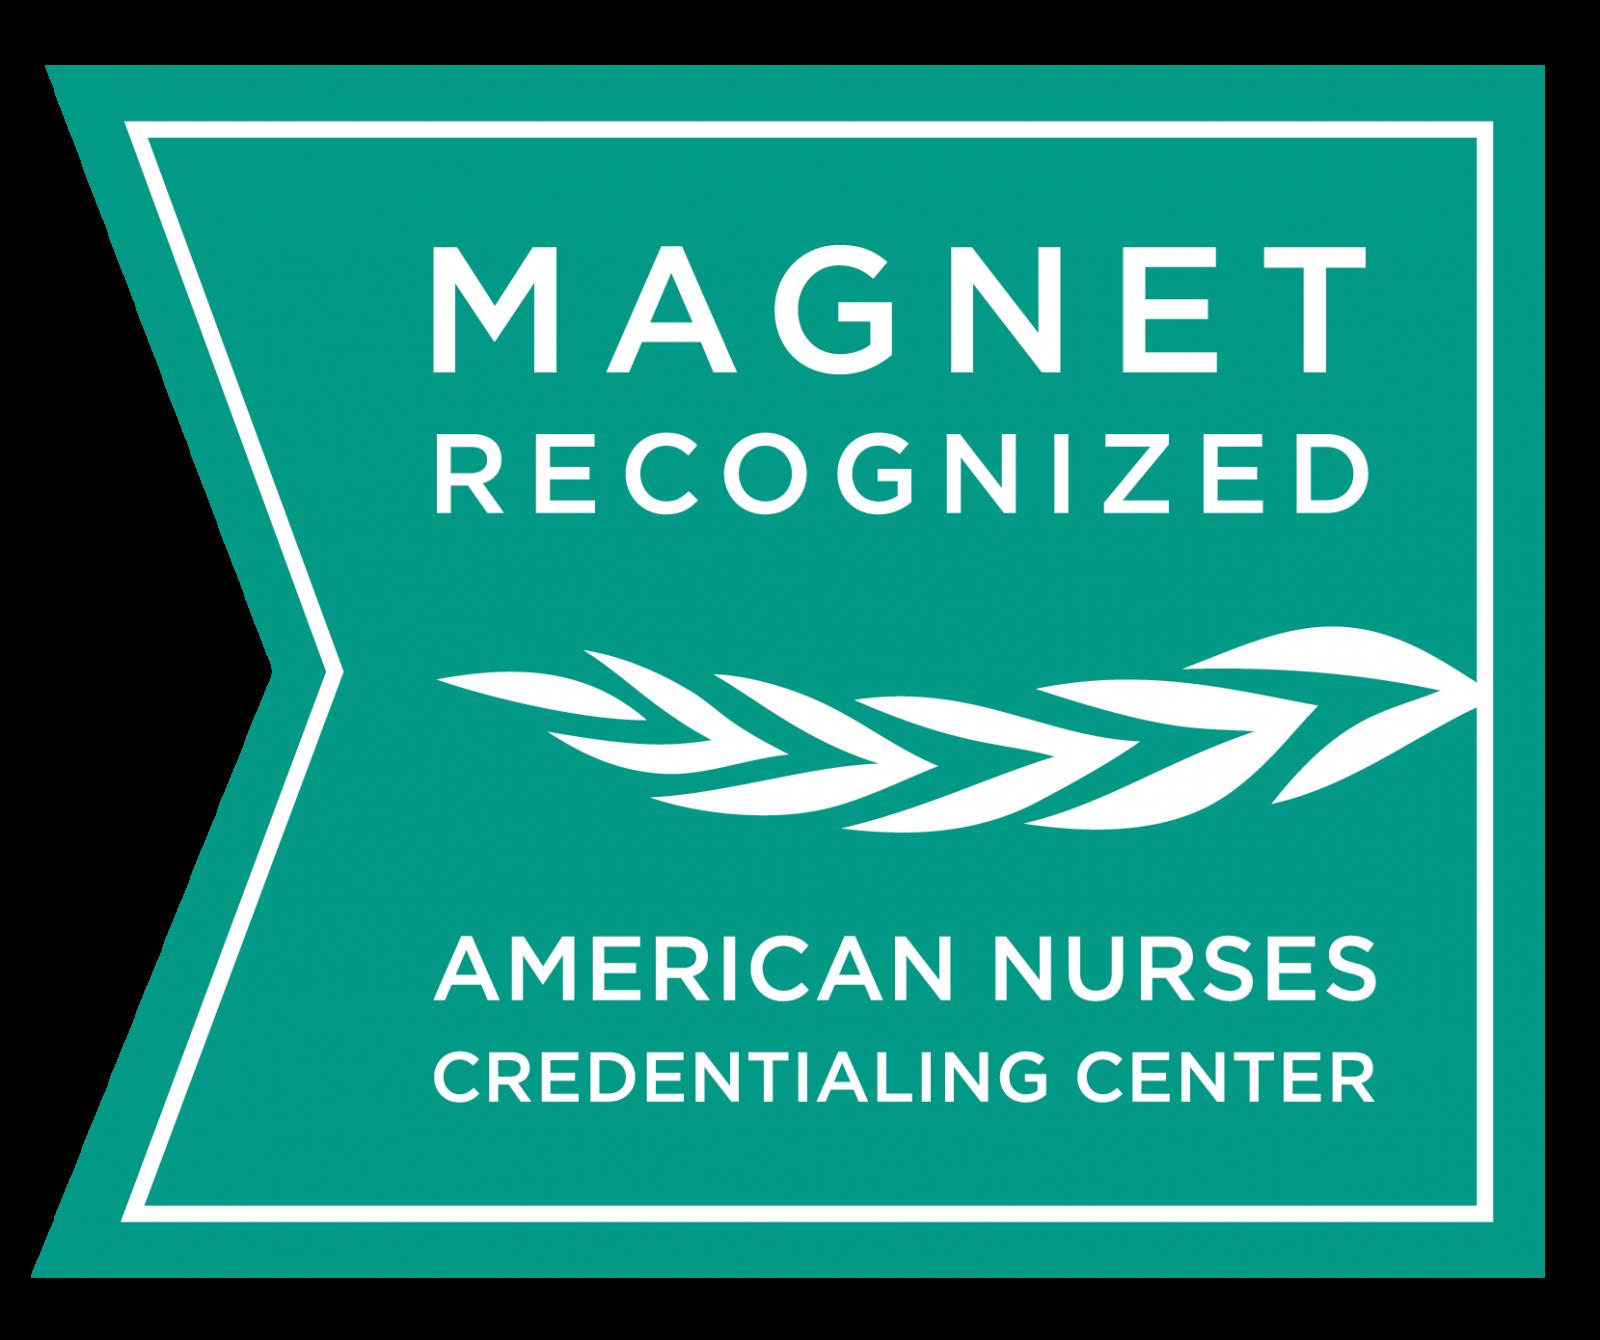 Nurse Magnet status badge